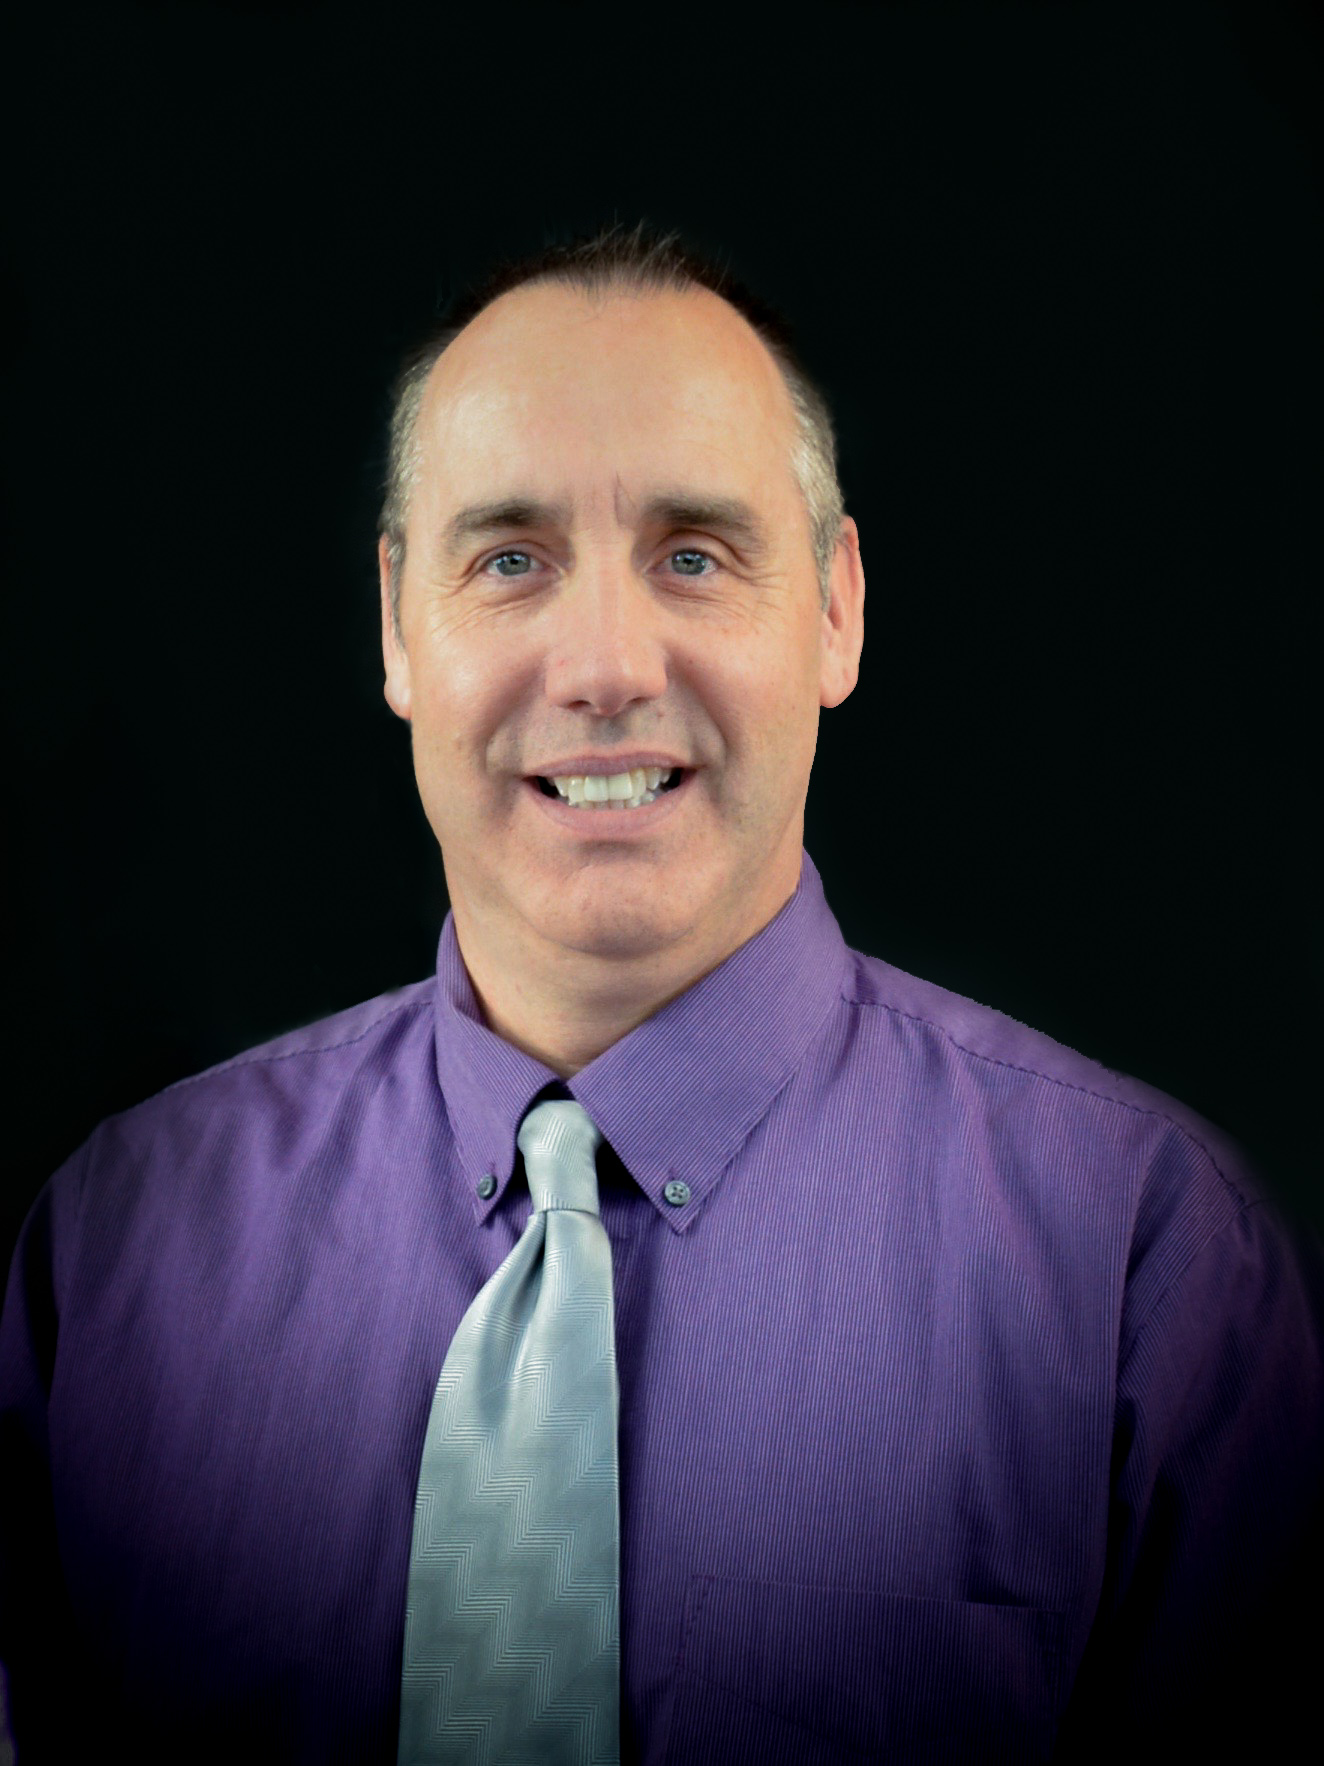 Bryant Jenks, MFT Therapist